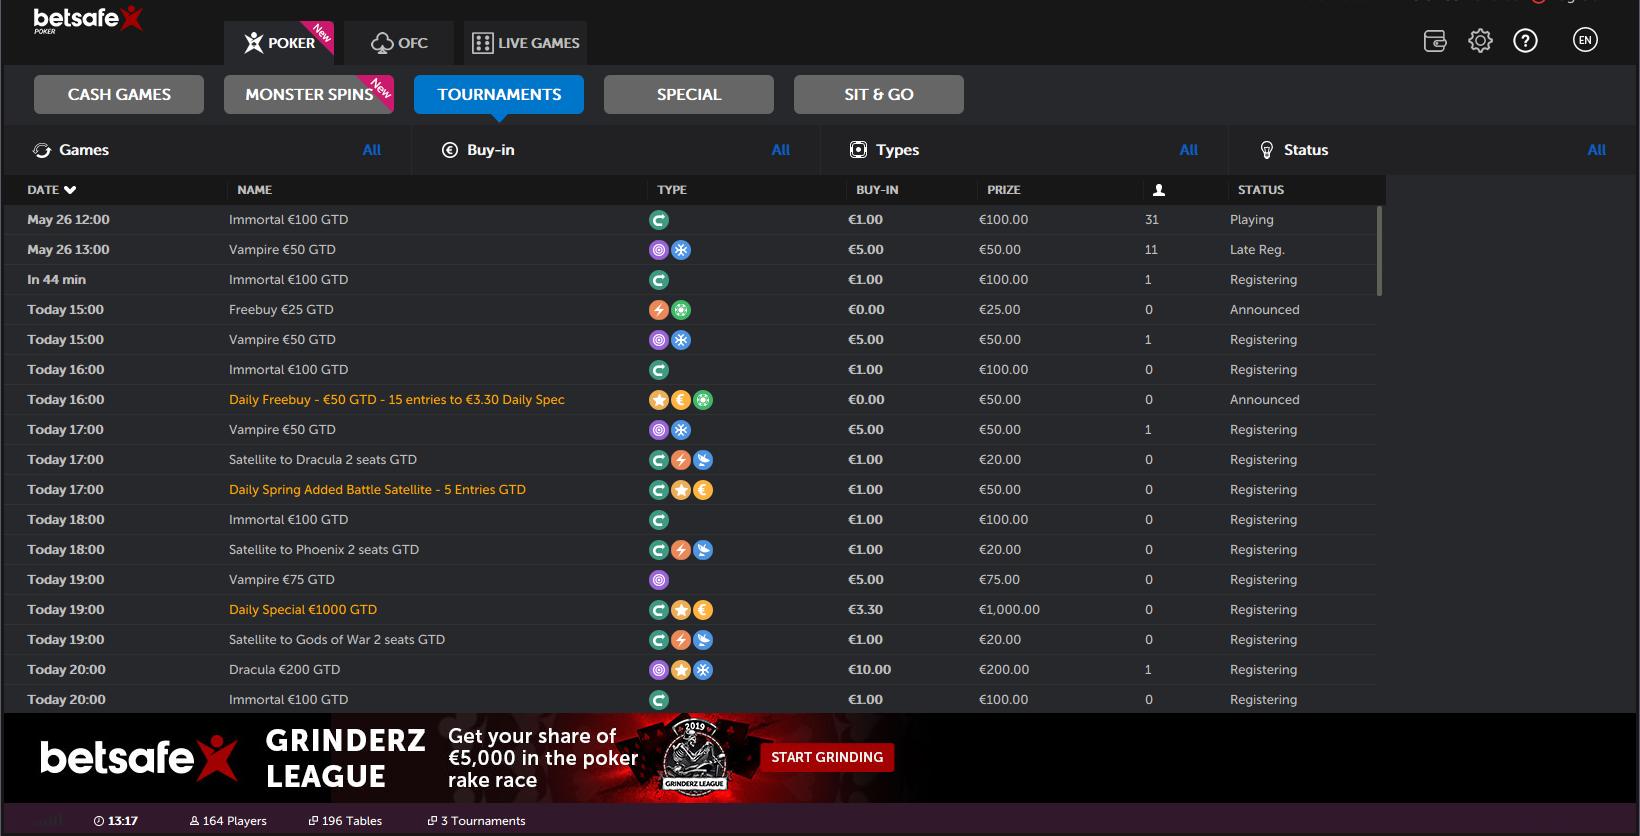 betsafe poker - monster spins sit go tournaments cash games grinderz league